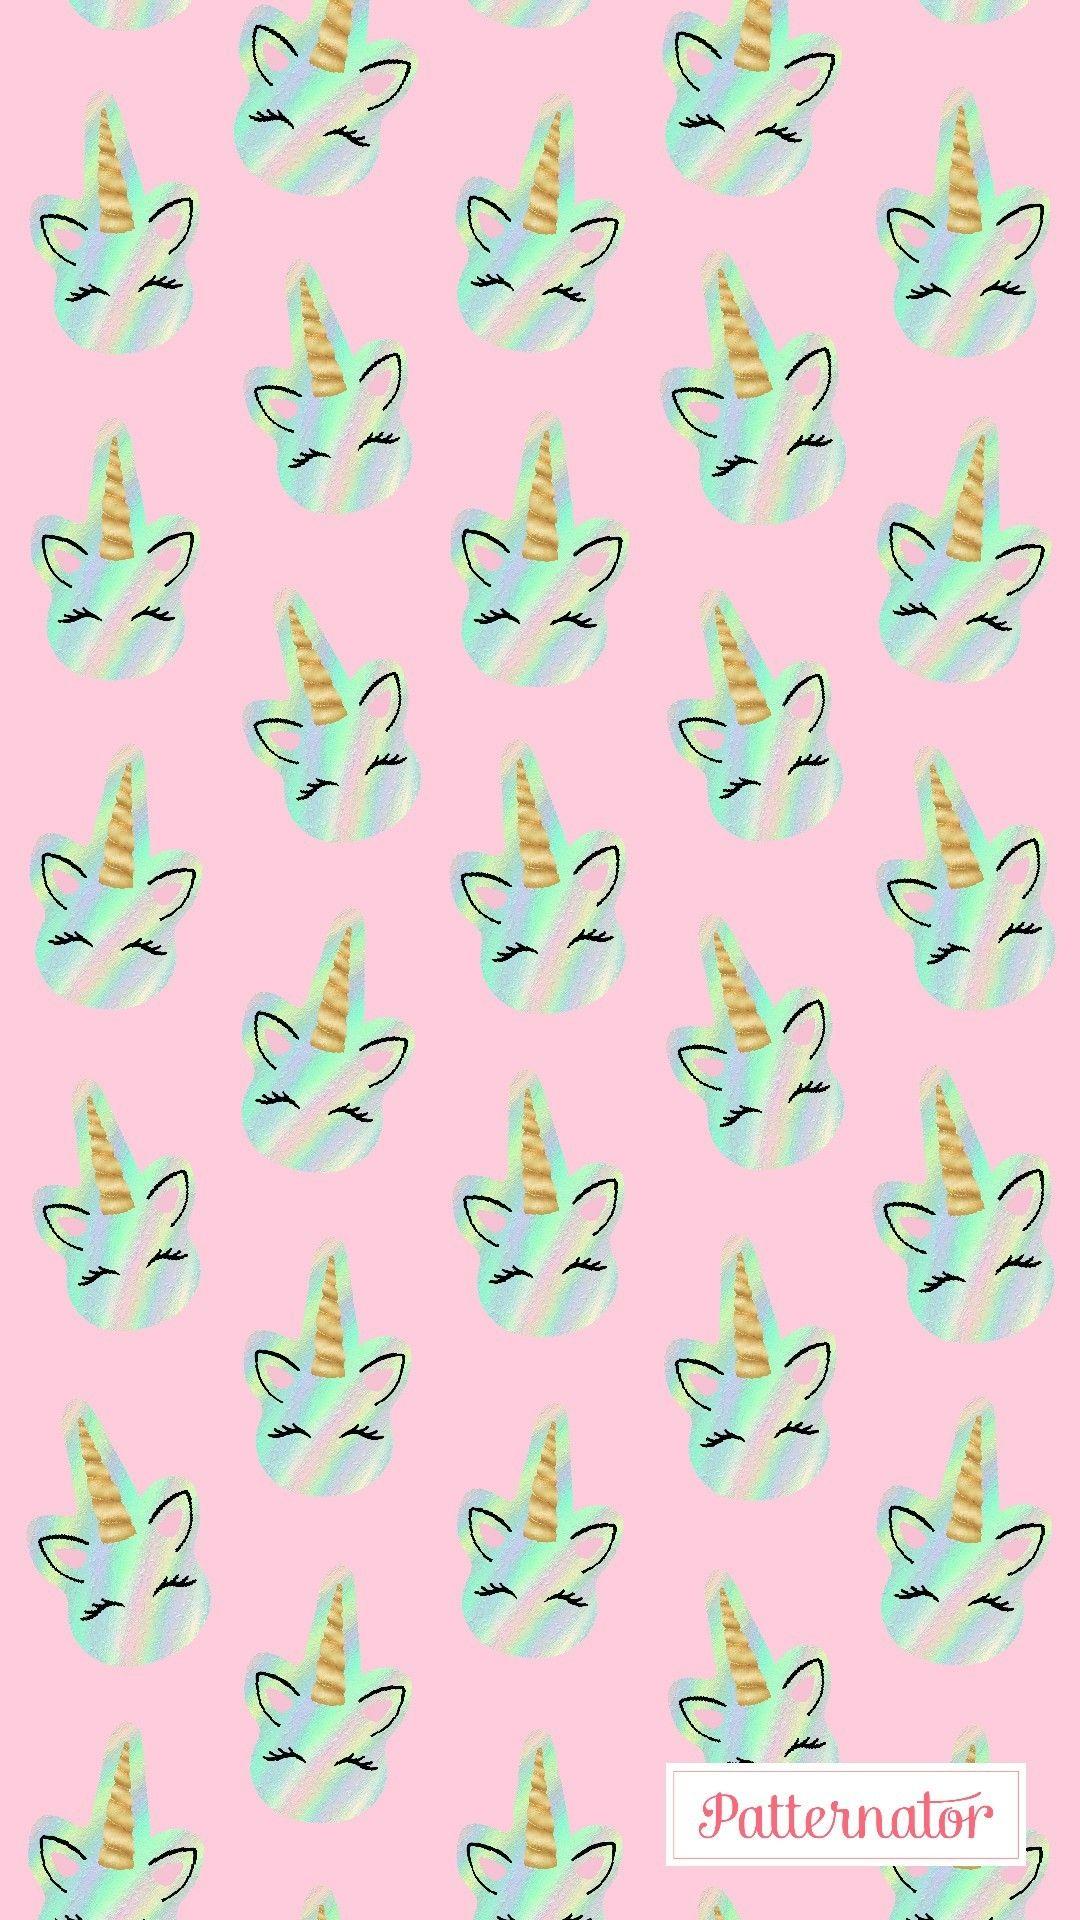 Cute Sanrio Wallpapers Pin By Pastel Prettiness On Unicorn※utopia Pinterest